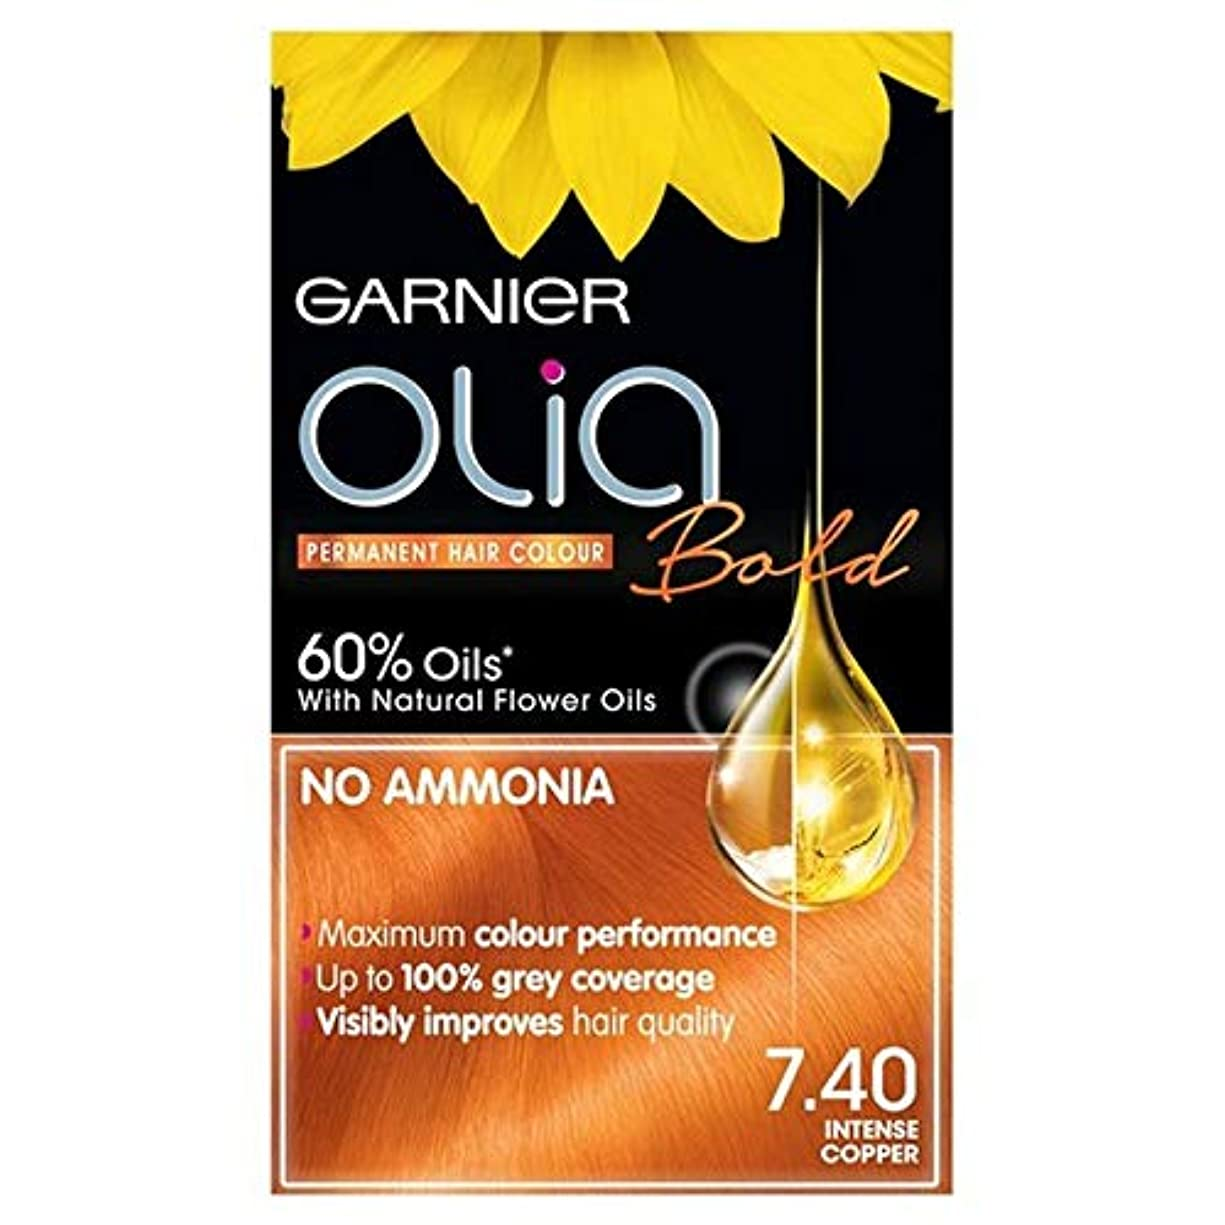 合唱団検査官階層[Garnier ] 7.40強烈銅永久染毛剤Oliaガルニエ - Garnier Olia 7.40 Intense Copper Permanent Hair Dye [並行輸入品]